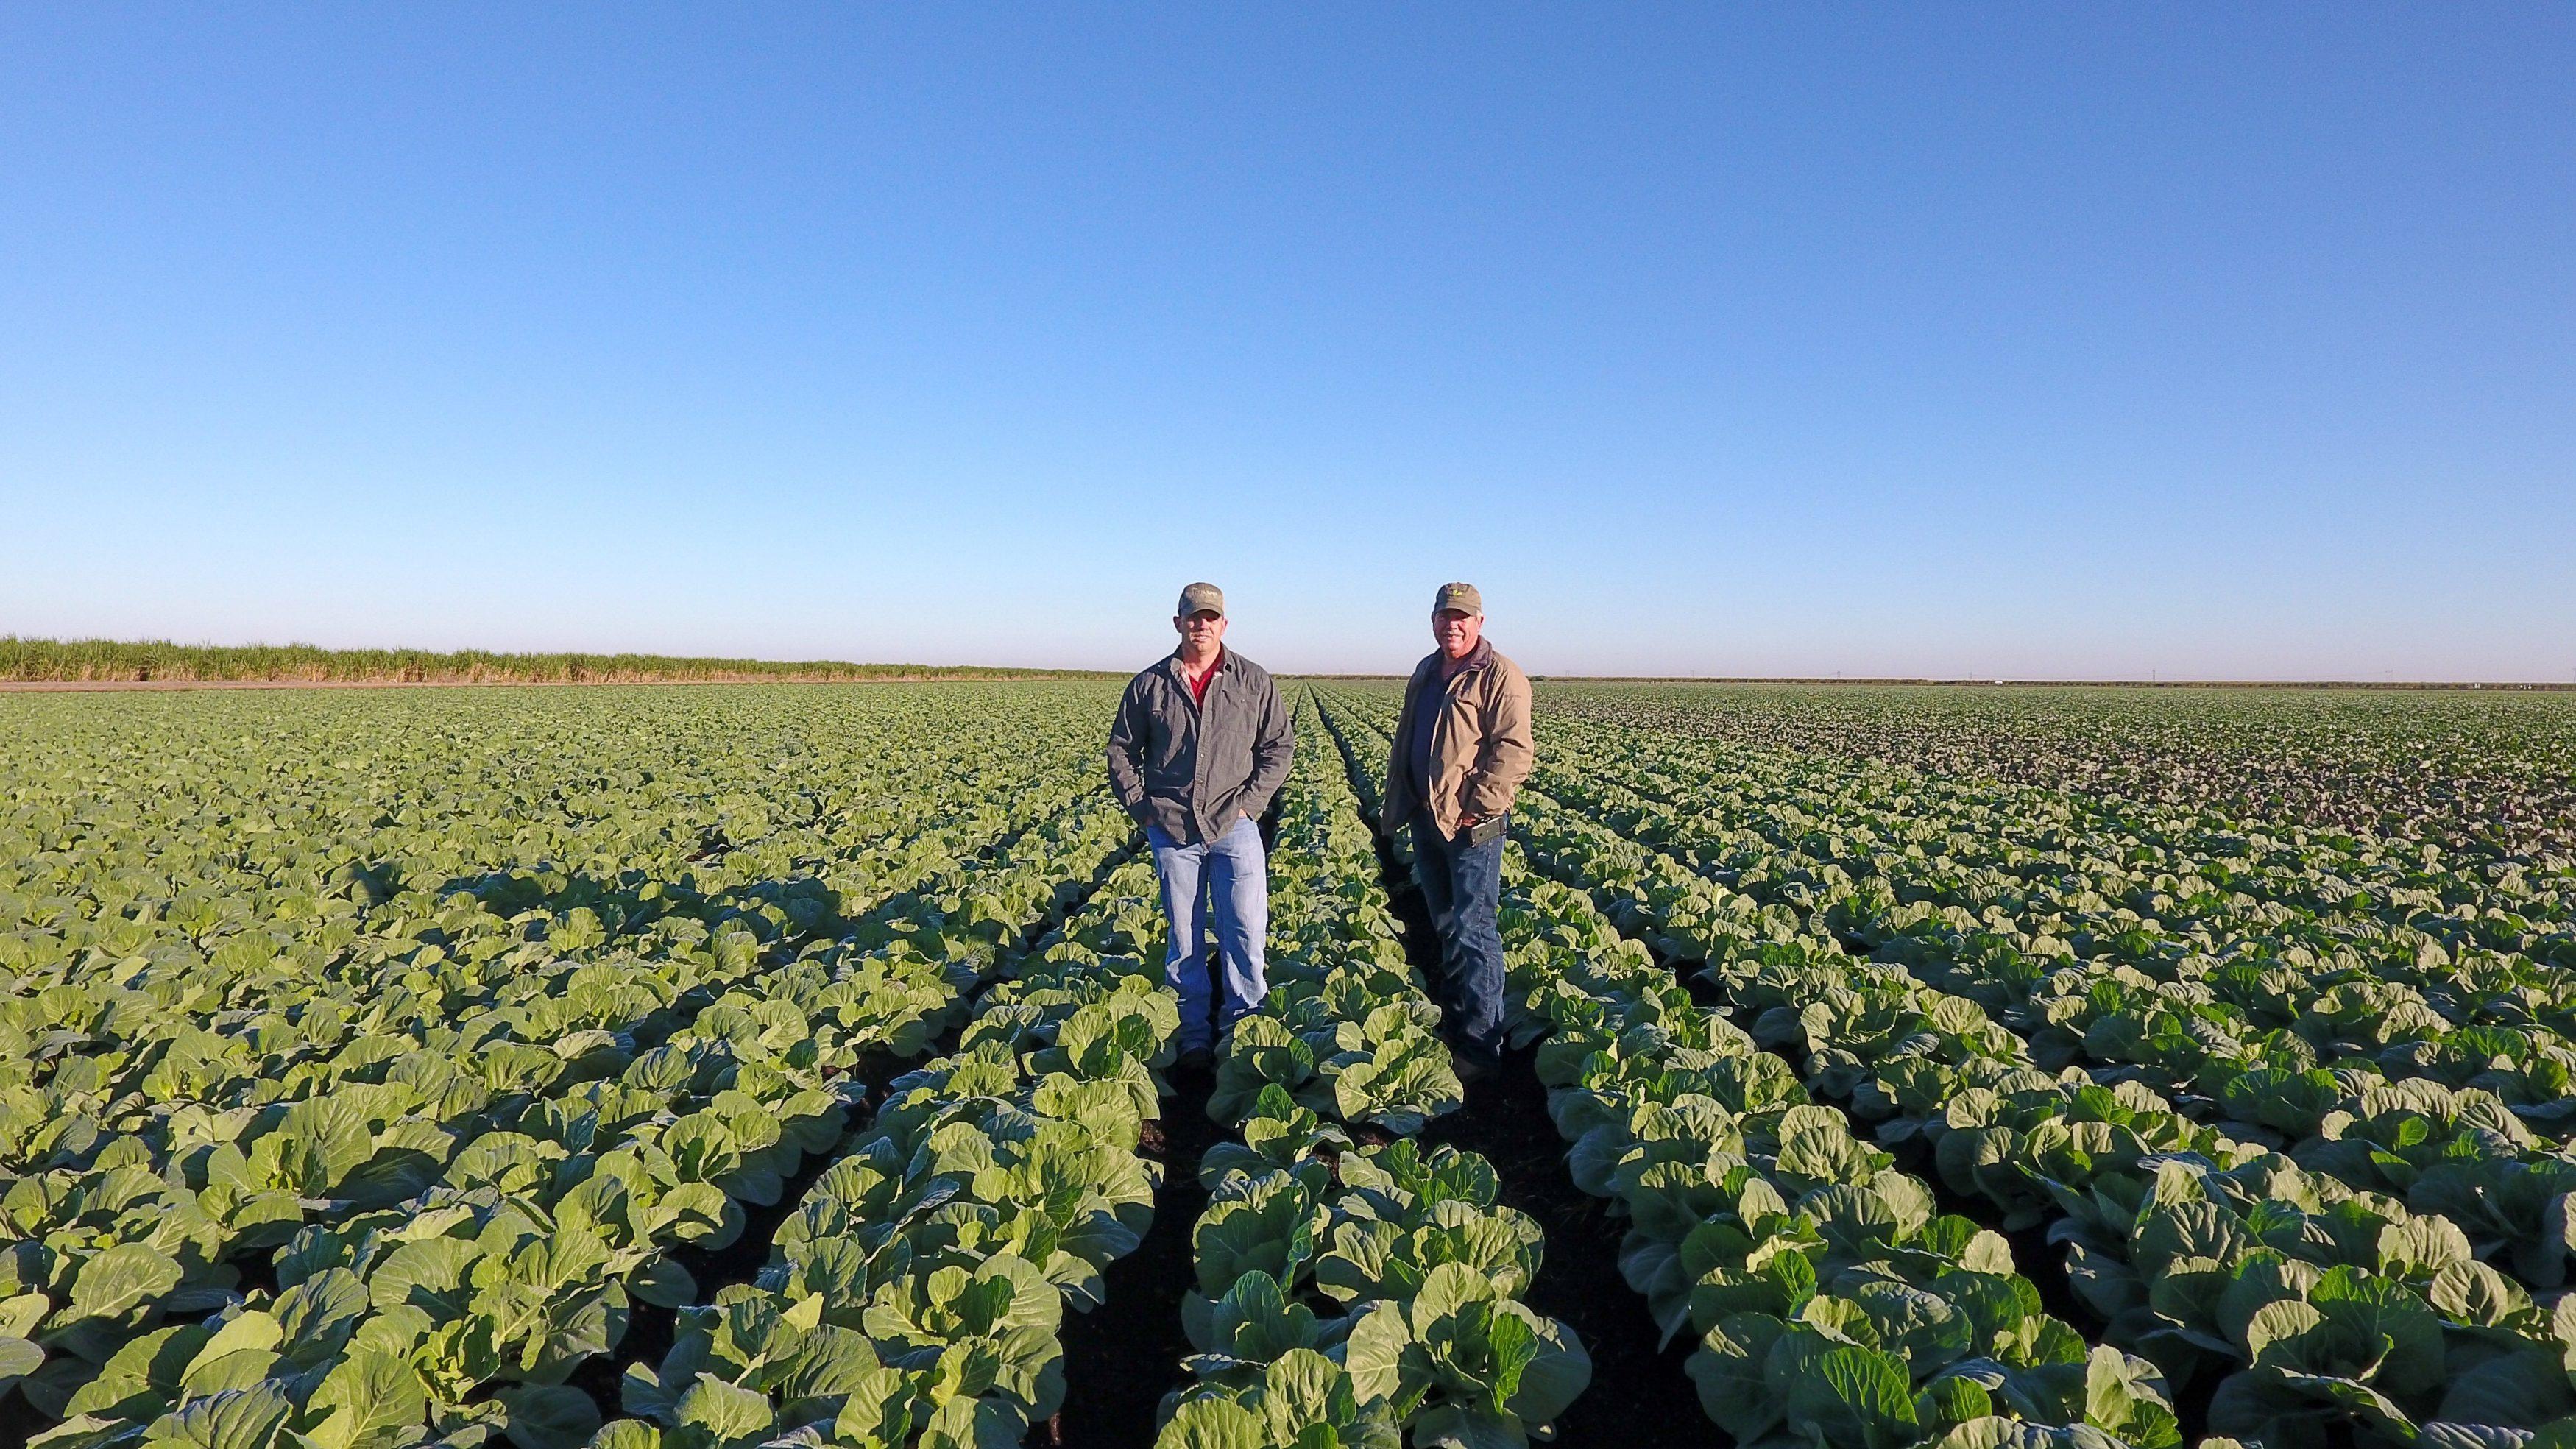 EAA-farmers-cabbage-day-3500x1969.jpg